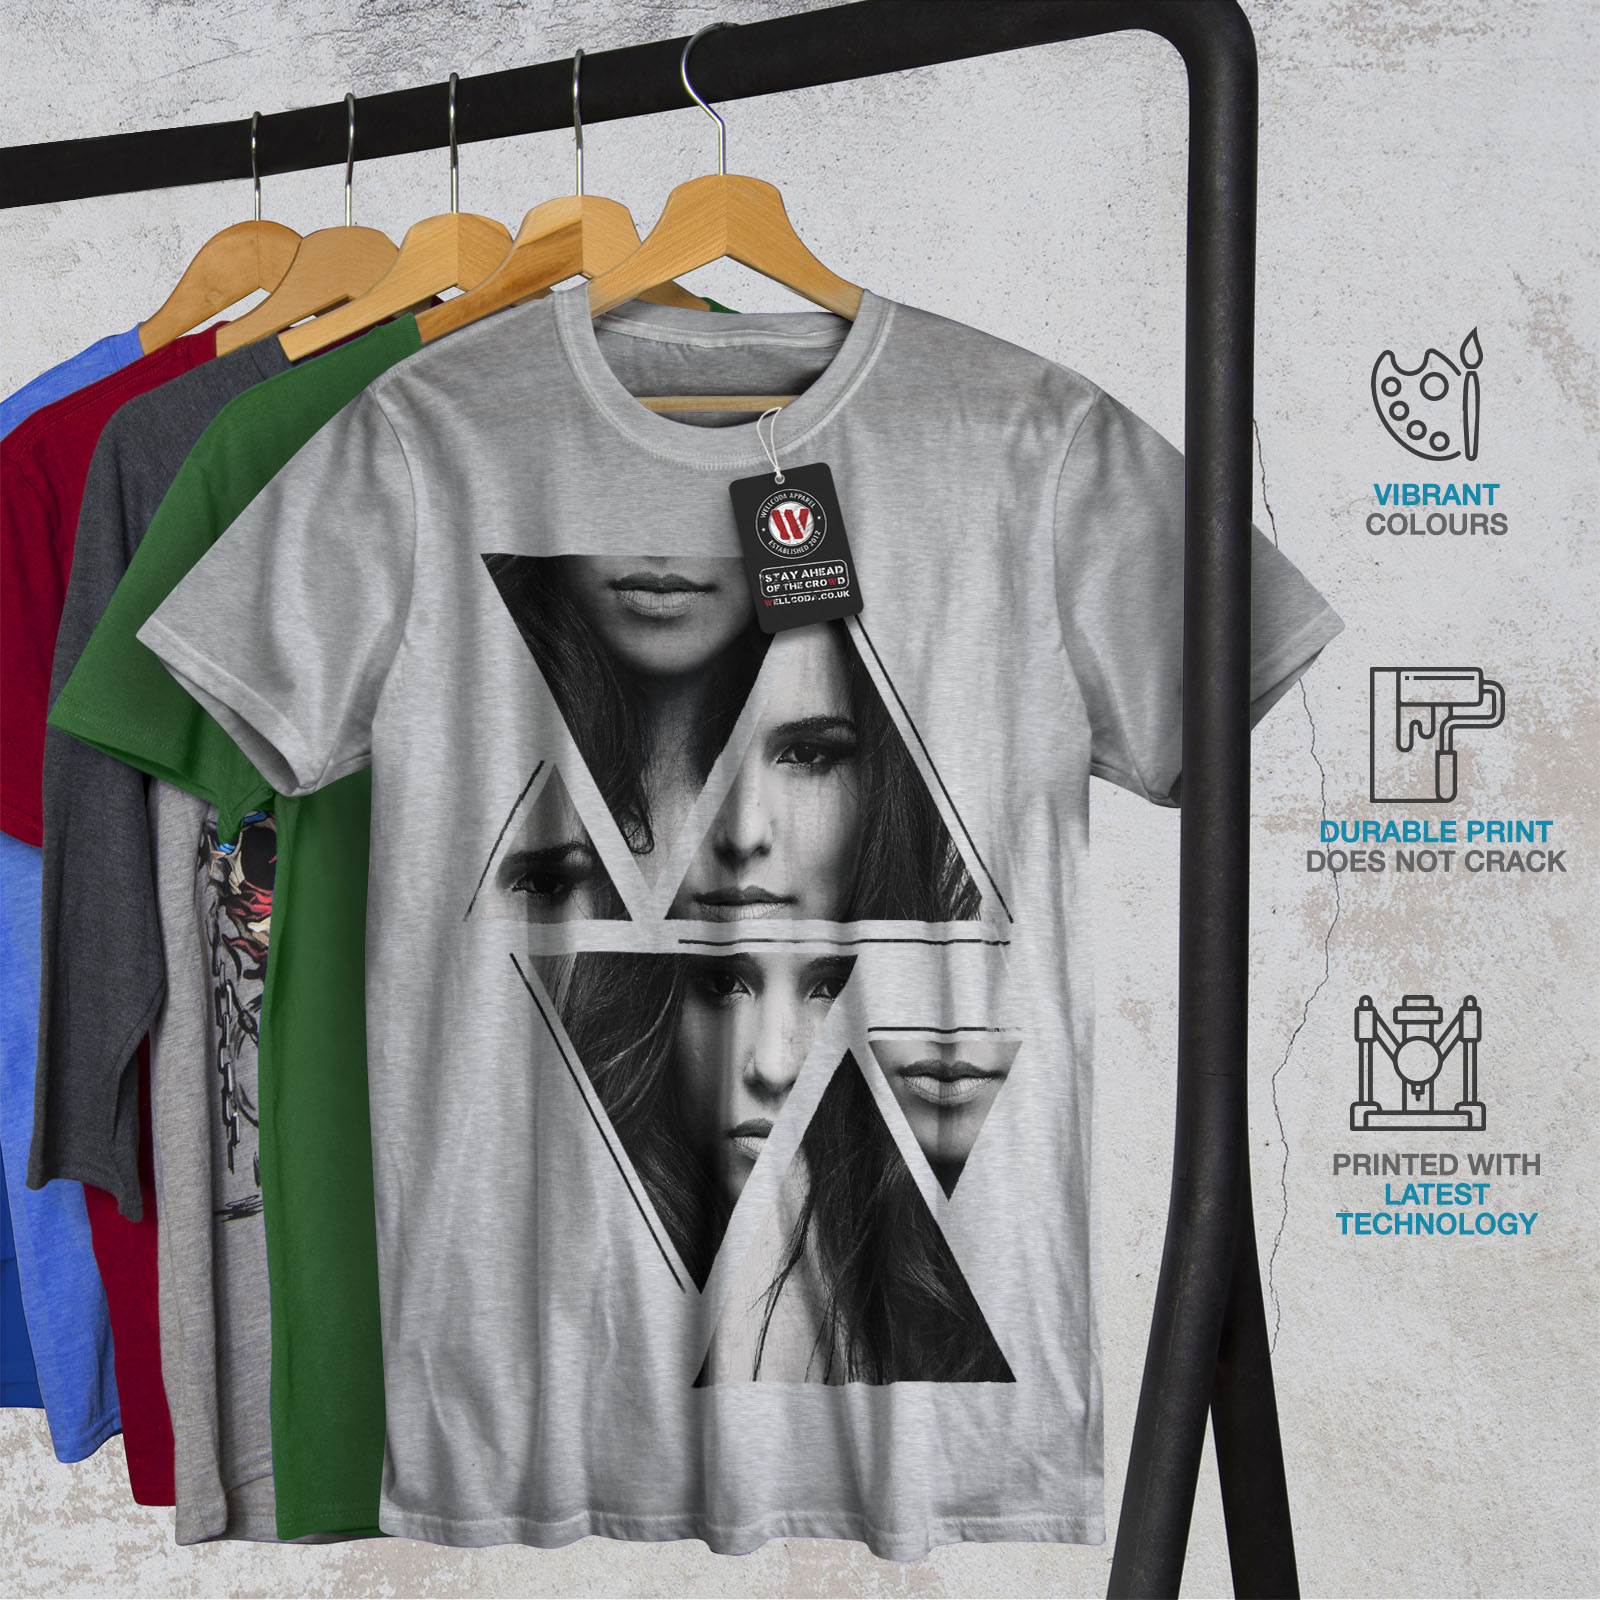 Wellcoda-Art-Fashion-Face-T-shirt-homme-Abstract-Design-graphique-imprime-Tee miniature 18